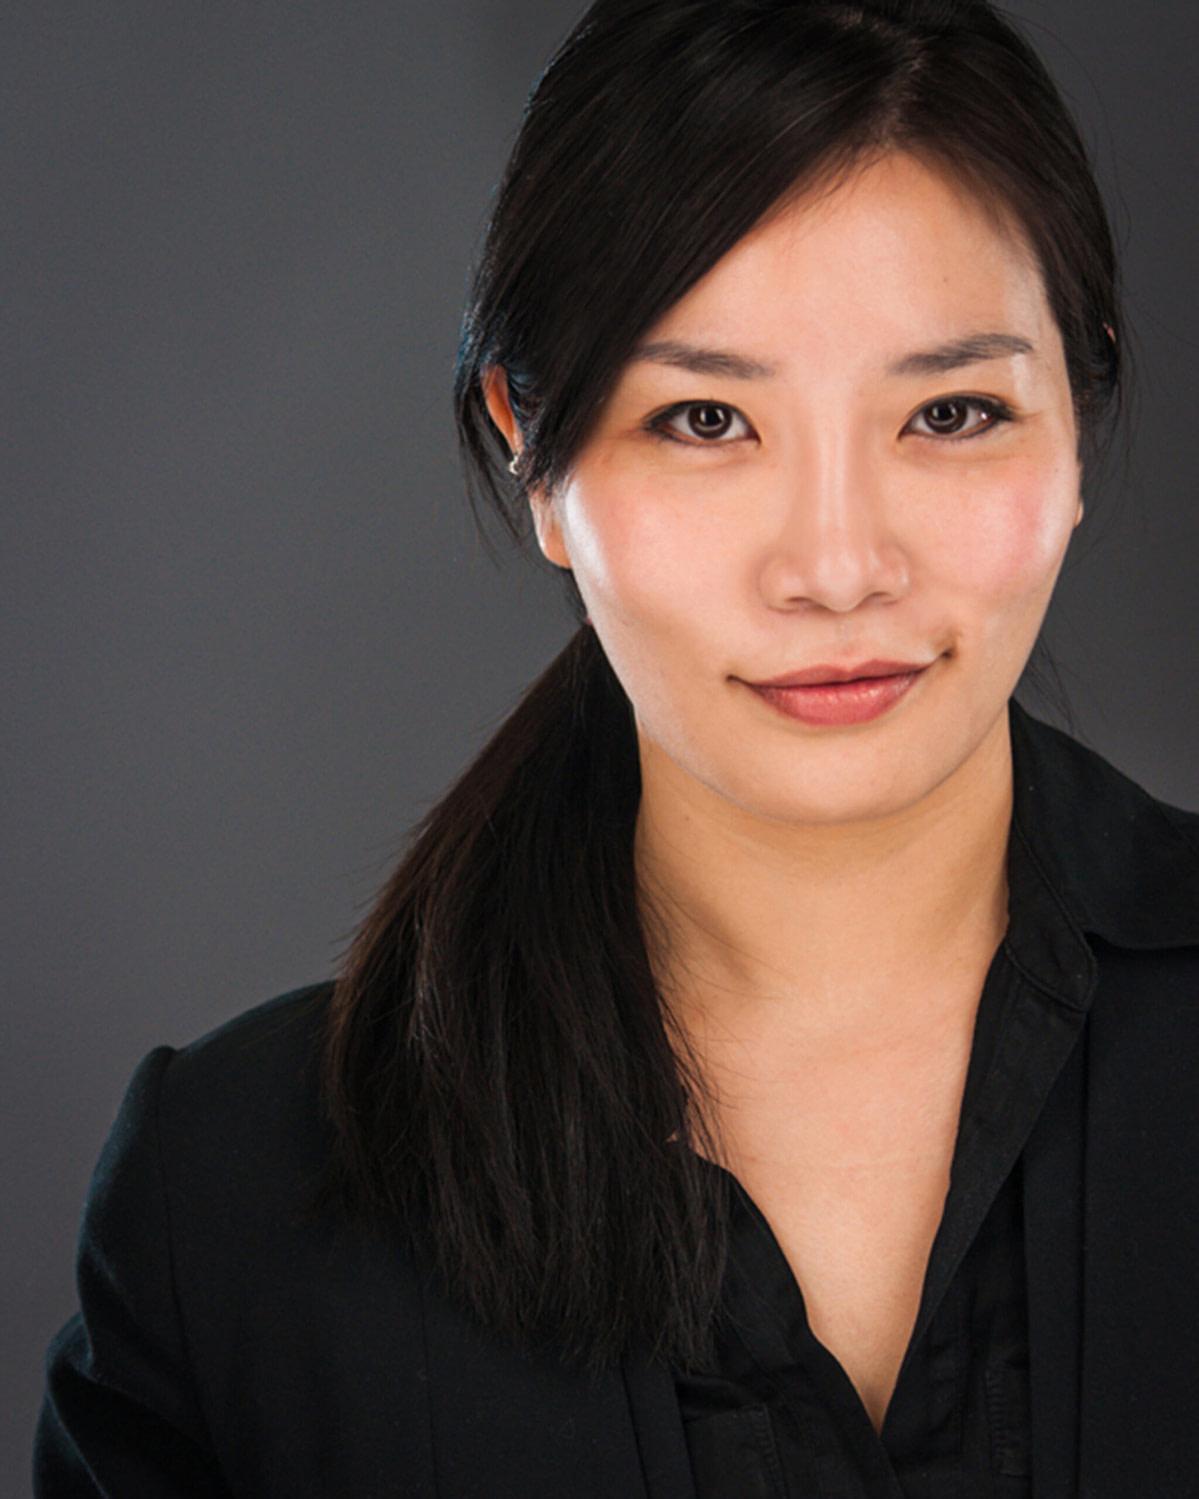 Vivian Ahn Vivian Ahn 267 of 289 scaled